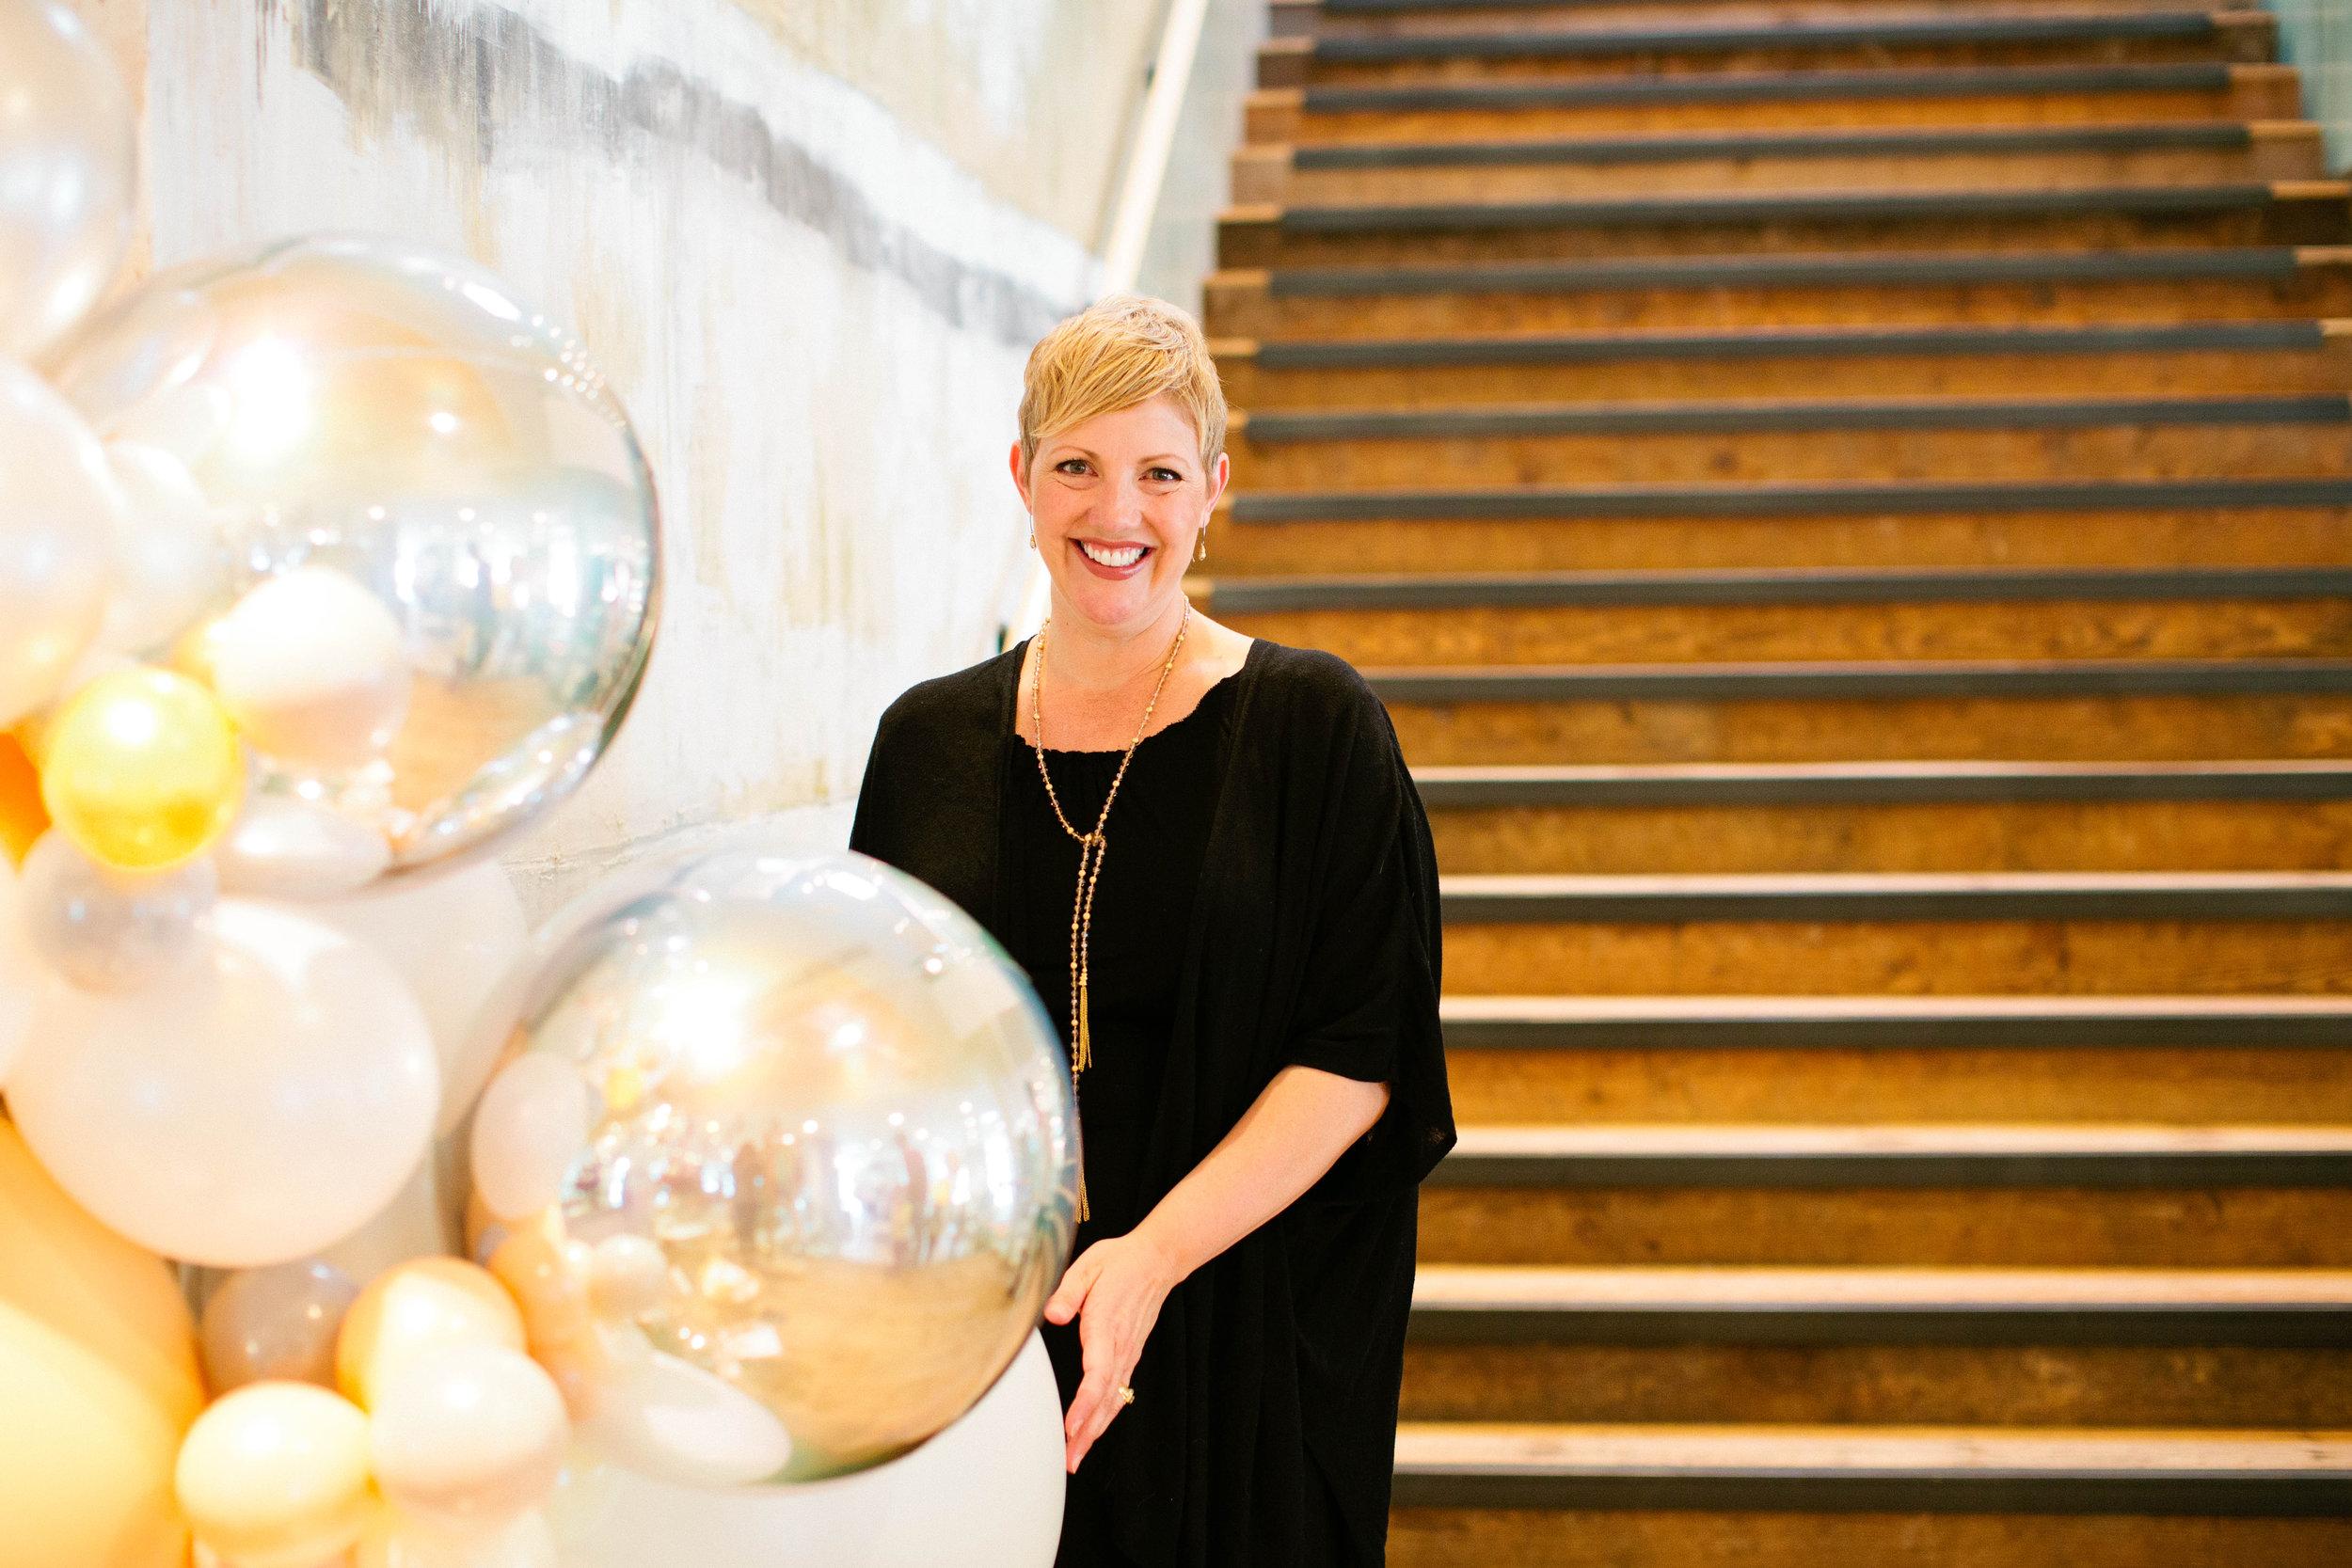 Lifted-Balloons-Nicole-Gilmore-Giant-Balloons